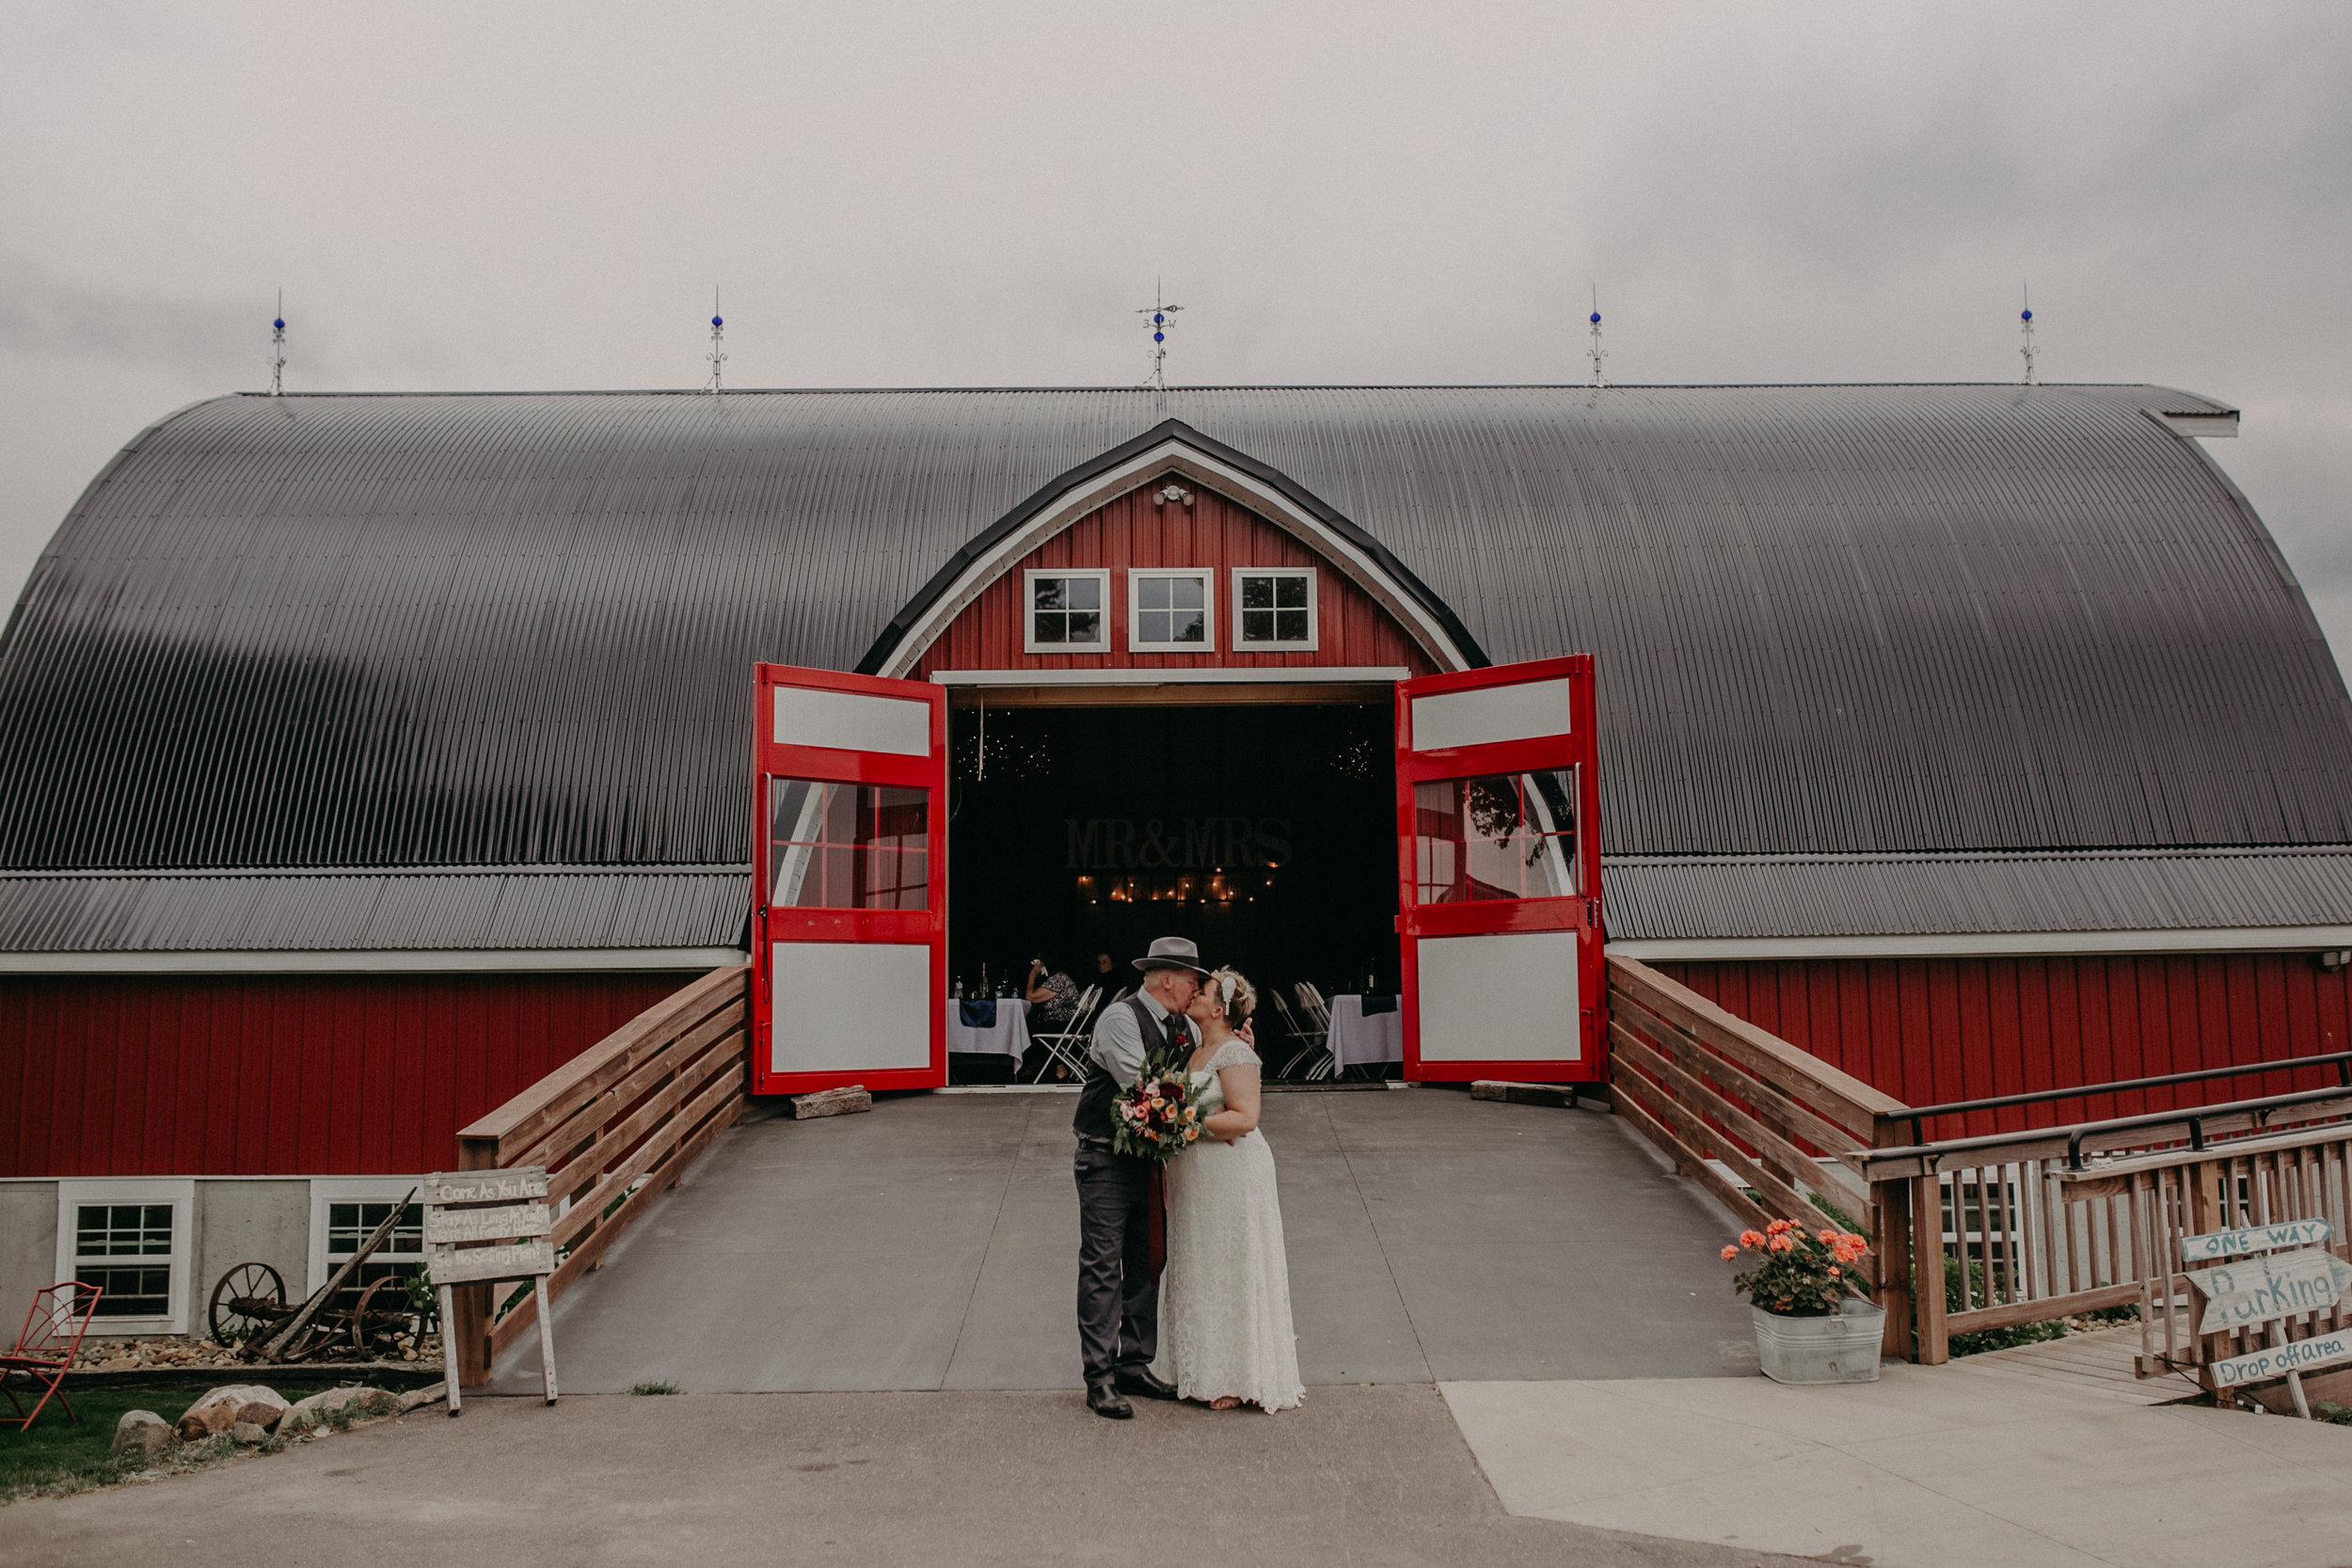 popular wedding venue in Ellsworth WI is Jean Acres Barn